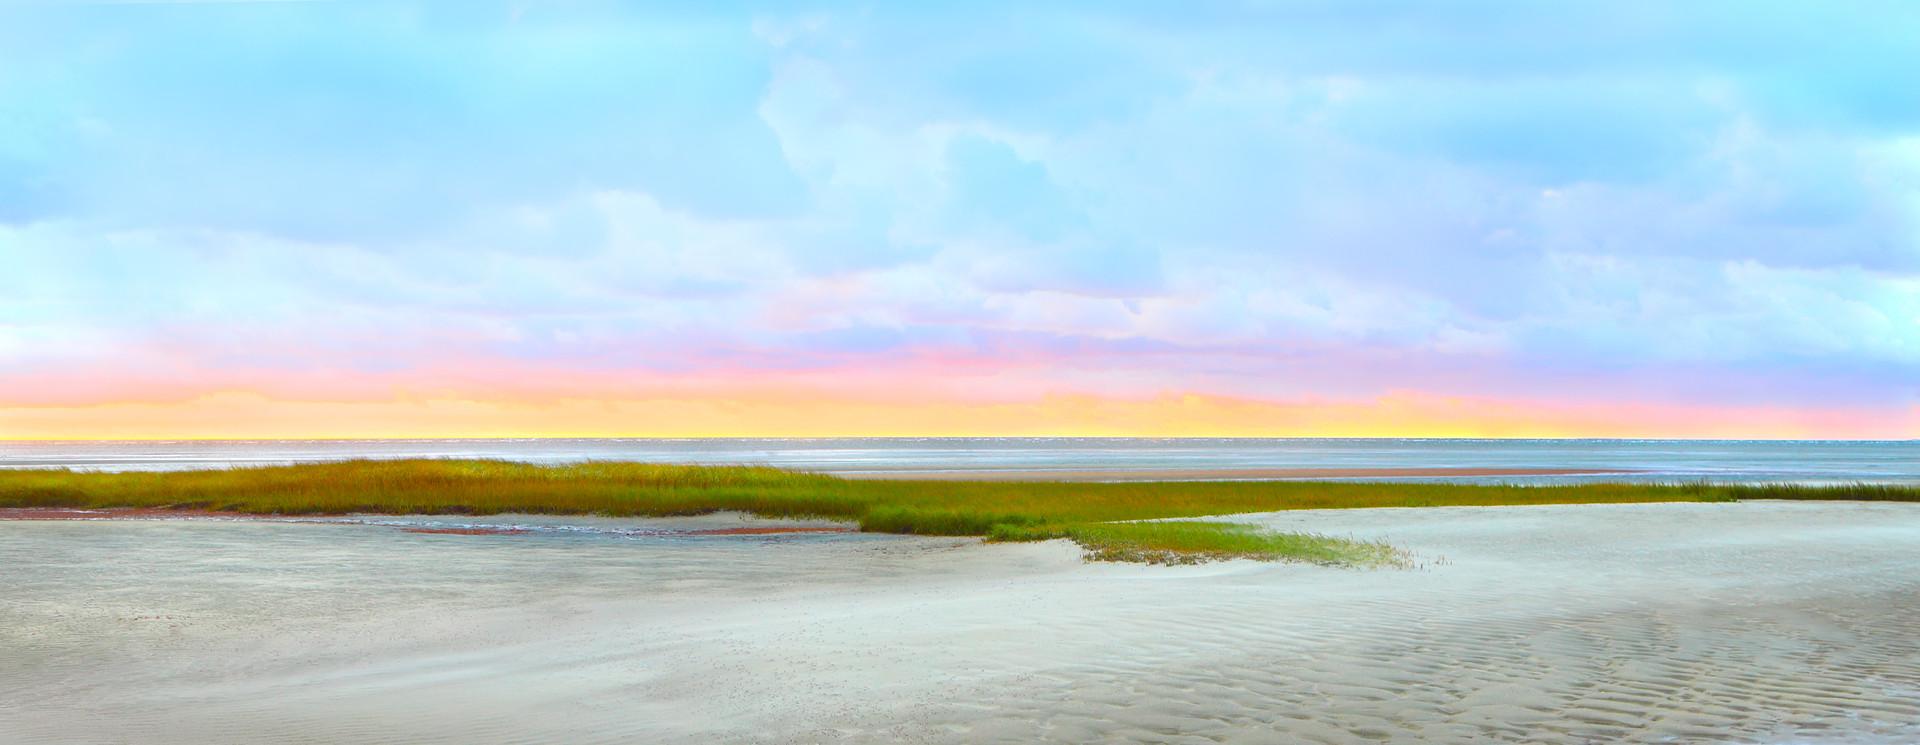 23 - Tidal Sunset